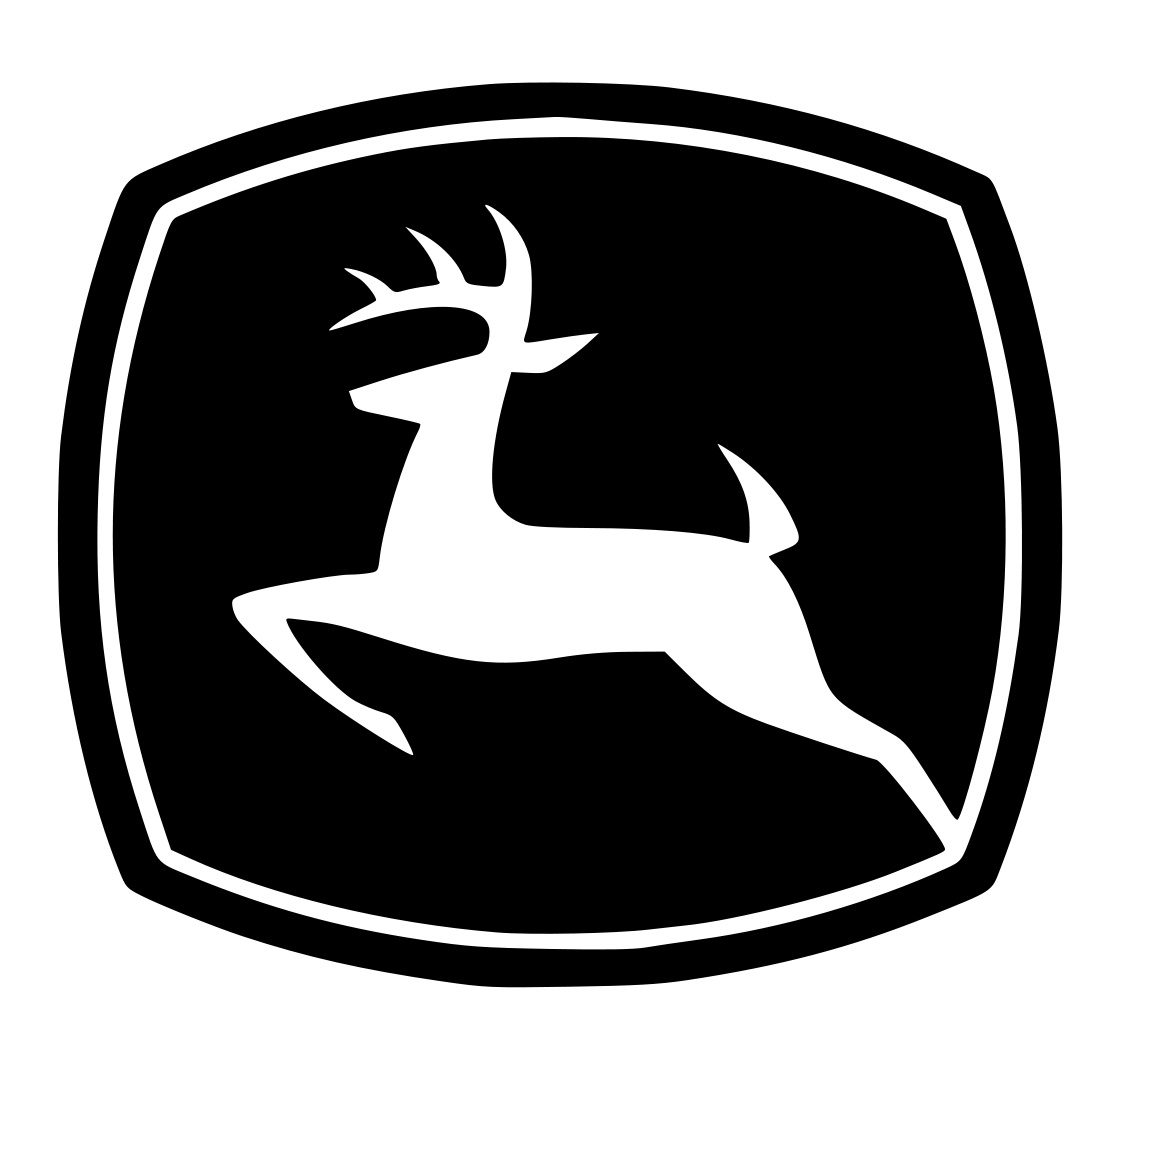 John Deer Svg File Download John Deer Silhouette Machine Silhouette Vinyl Silhouette Cameo Projects